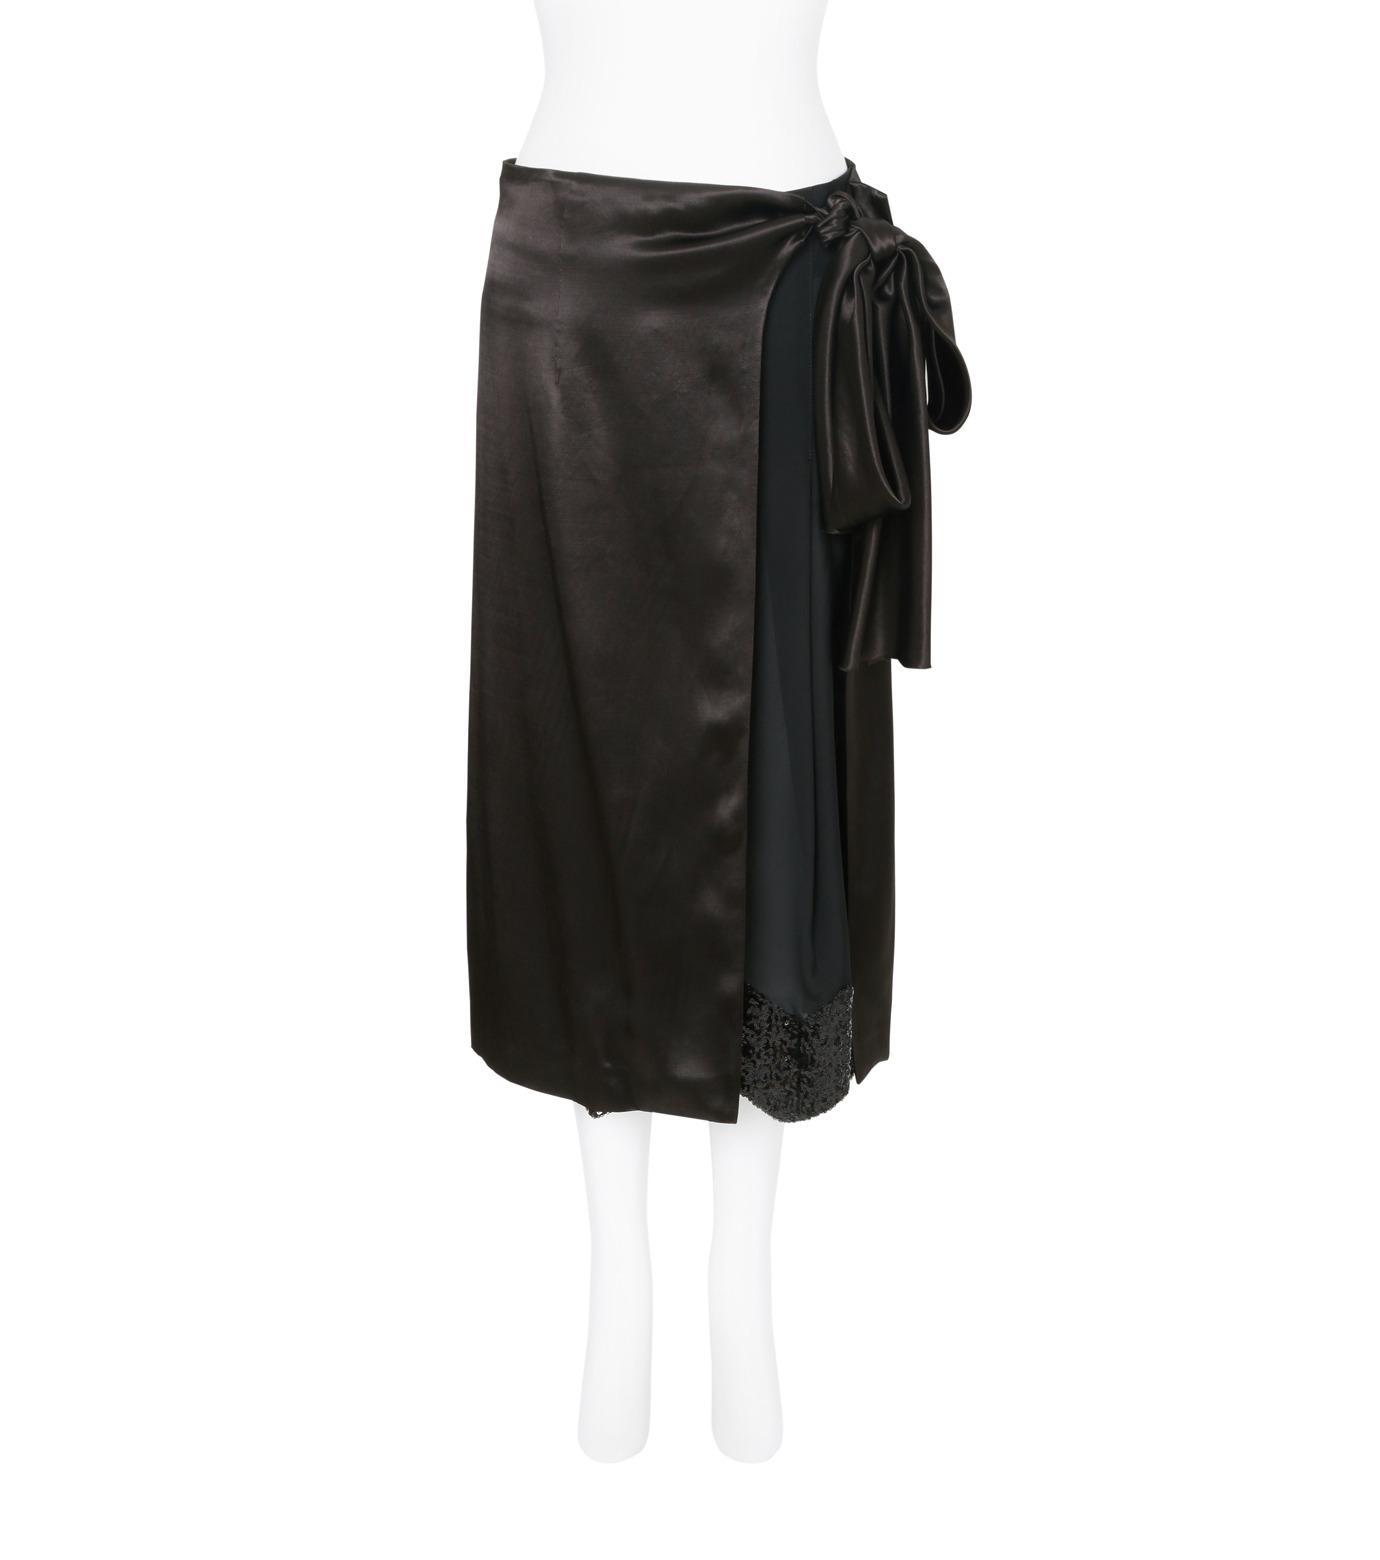 Toga Pulla(トーガ プルラ)のRayon Satin Skirt w/Sequin-BLACK(スカート/skirt)-TP71-FG238-13 拡大詳細画像1